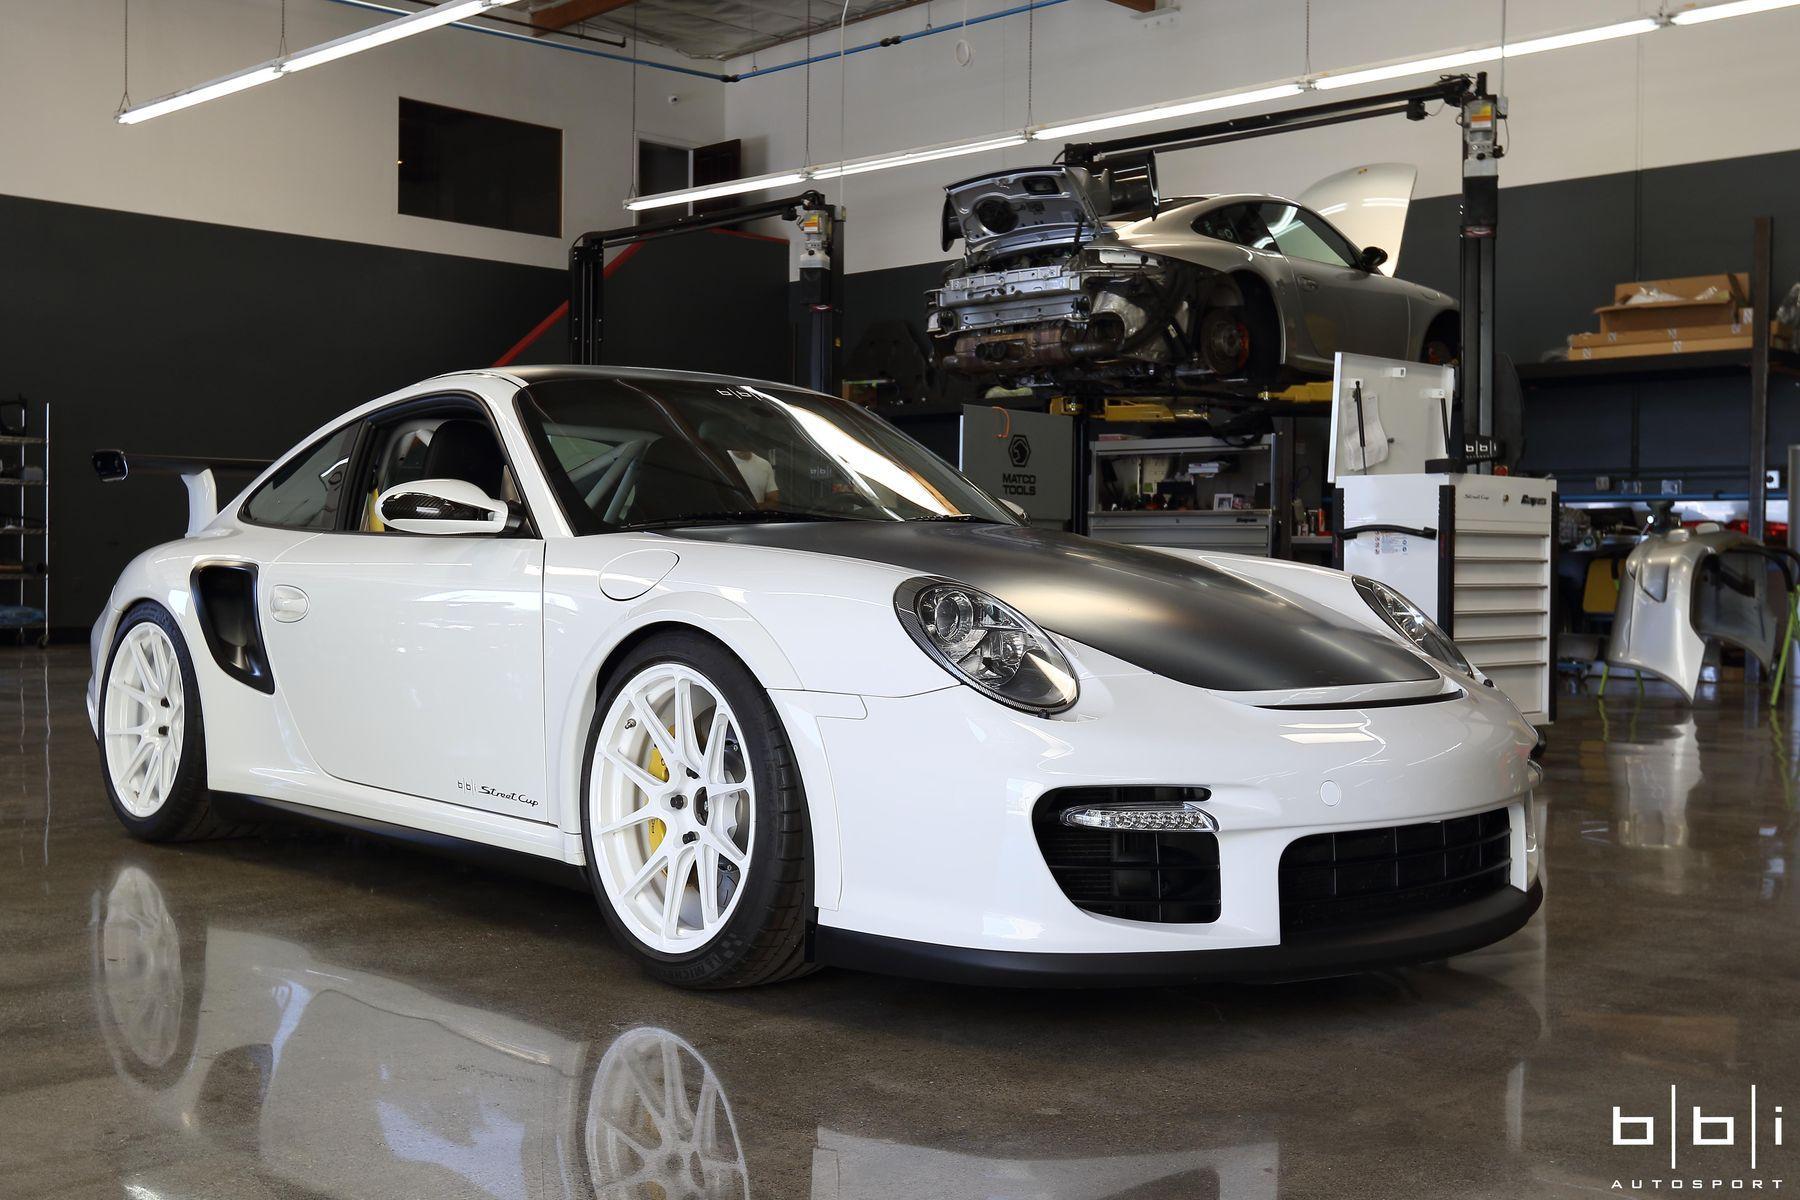 2016 Porsche 911   BBi Autosport's Project Swan Porsche 911 Turbo Wins TUNED Tuner Car Shootout on Forgeline One Piece Forged Monoblock GA1R Open Lug Wheels